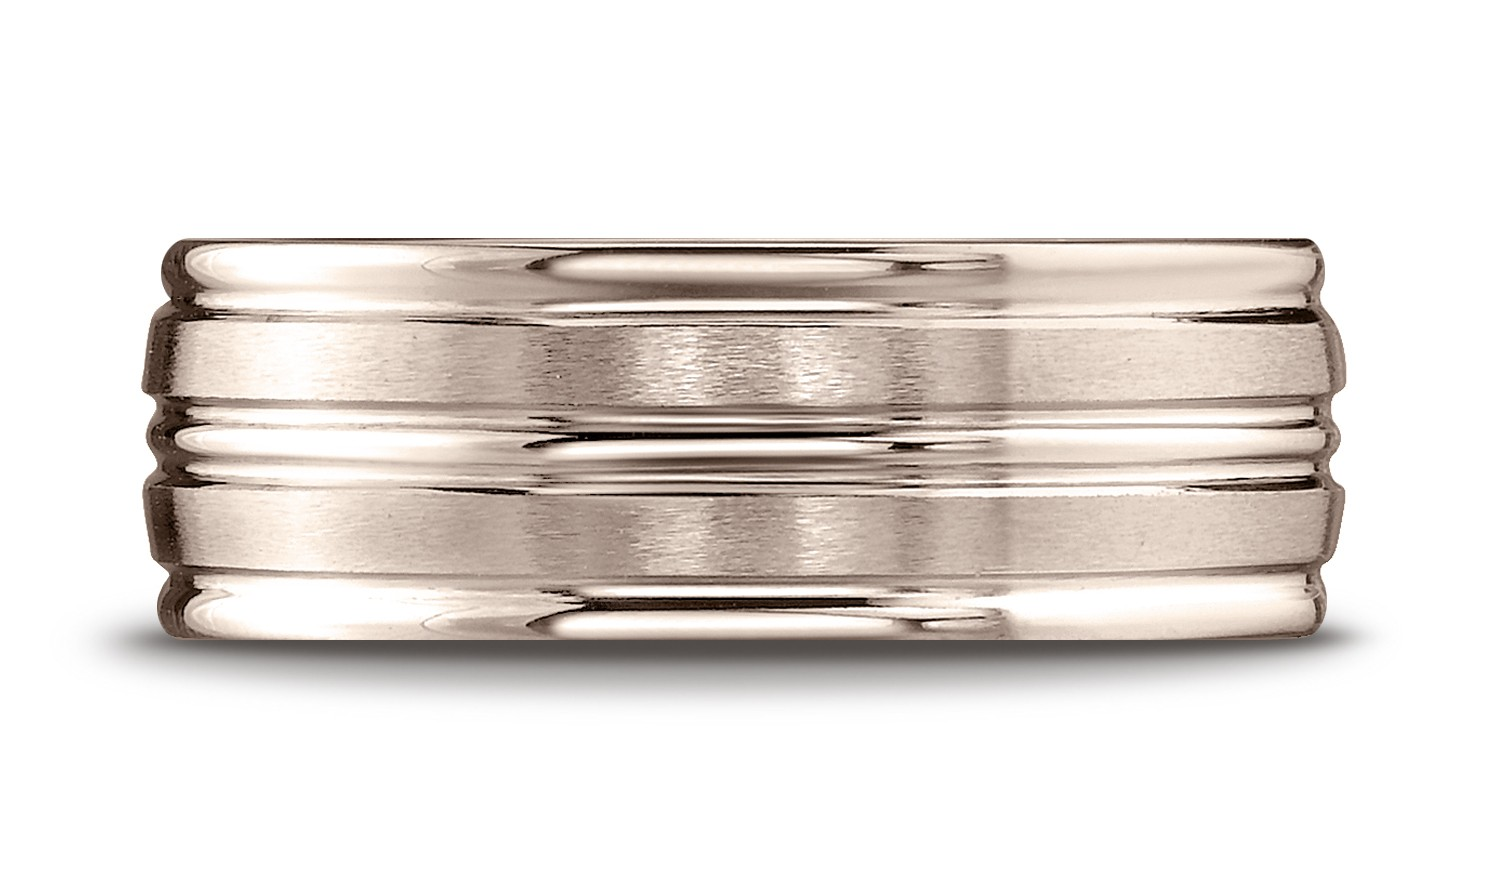 14k Rose Gold 8mm Comfort-fit Satin-finished High Polished Center Trim And Round Edge Carved Design Band